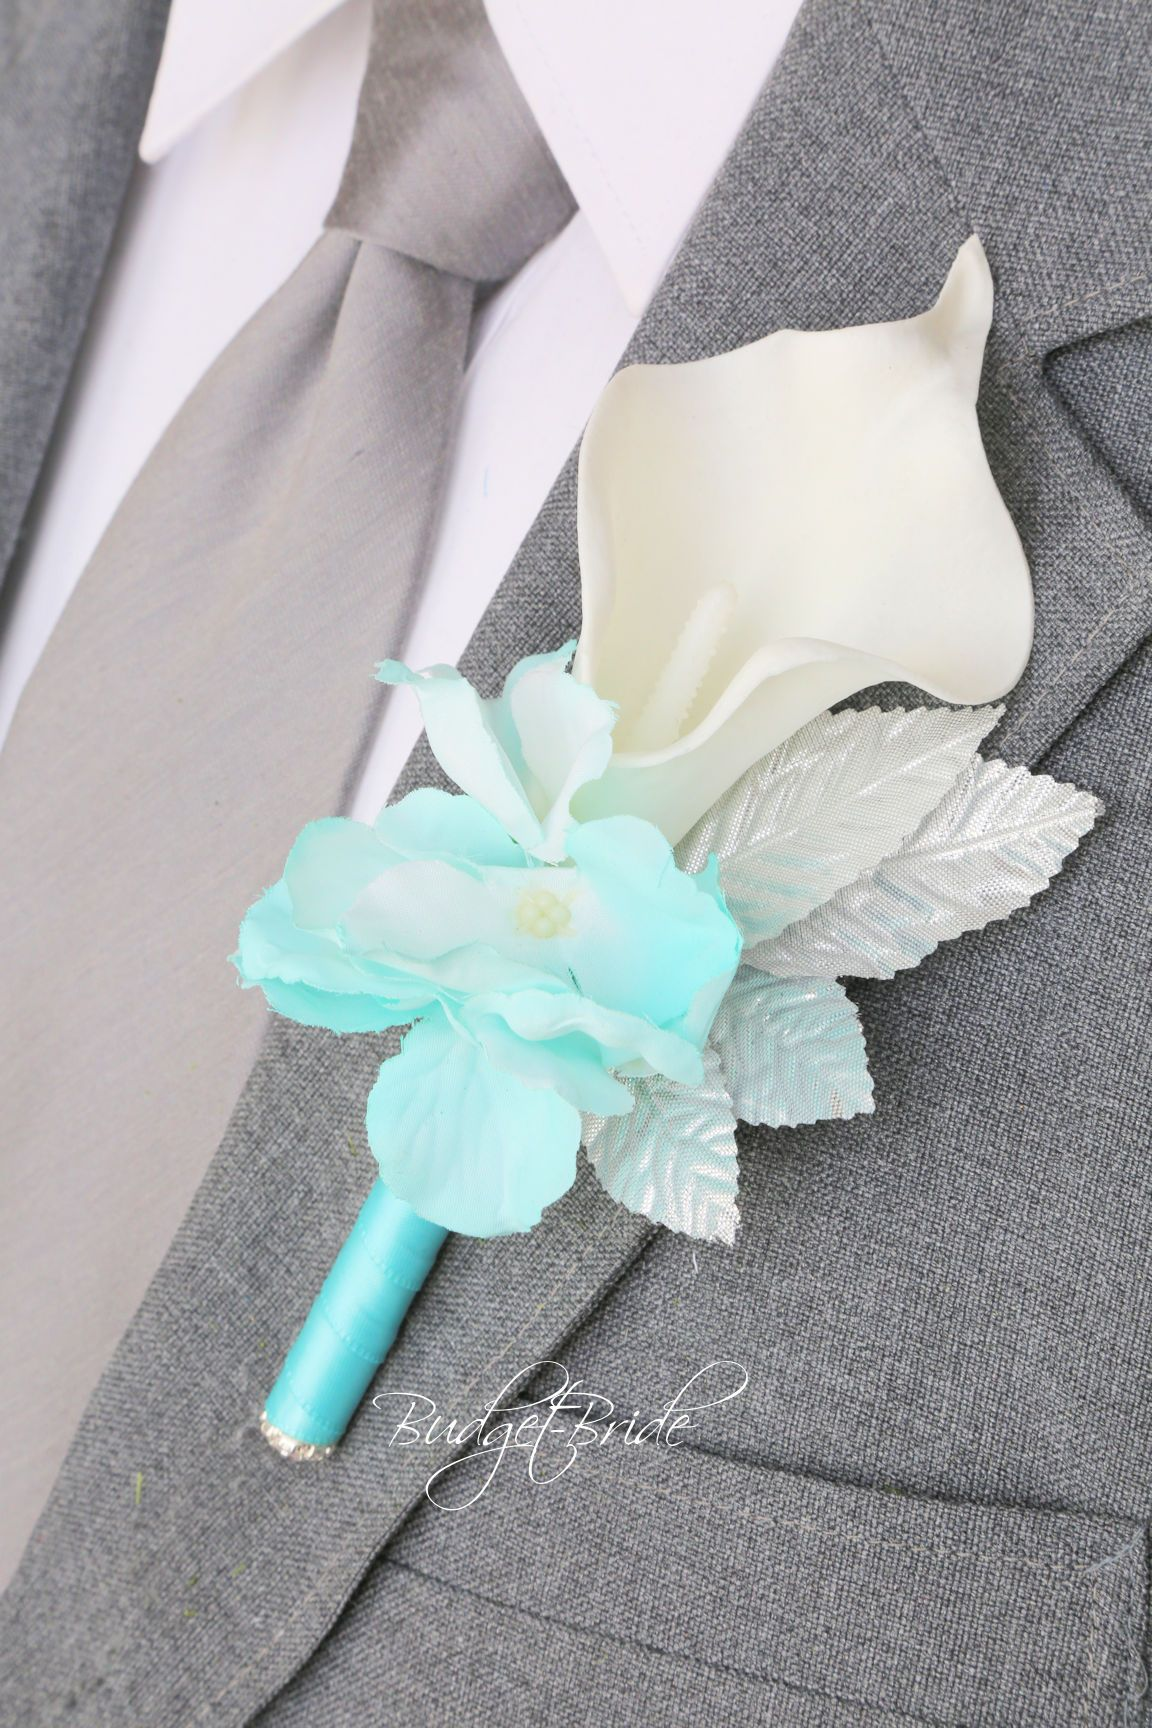 Tiffany blue and silver theme wedding flowers davids bridal spa tiffany blue and silver theme wedding flowers davids bridal spa dresses izmirmasajfo